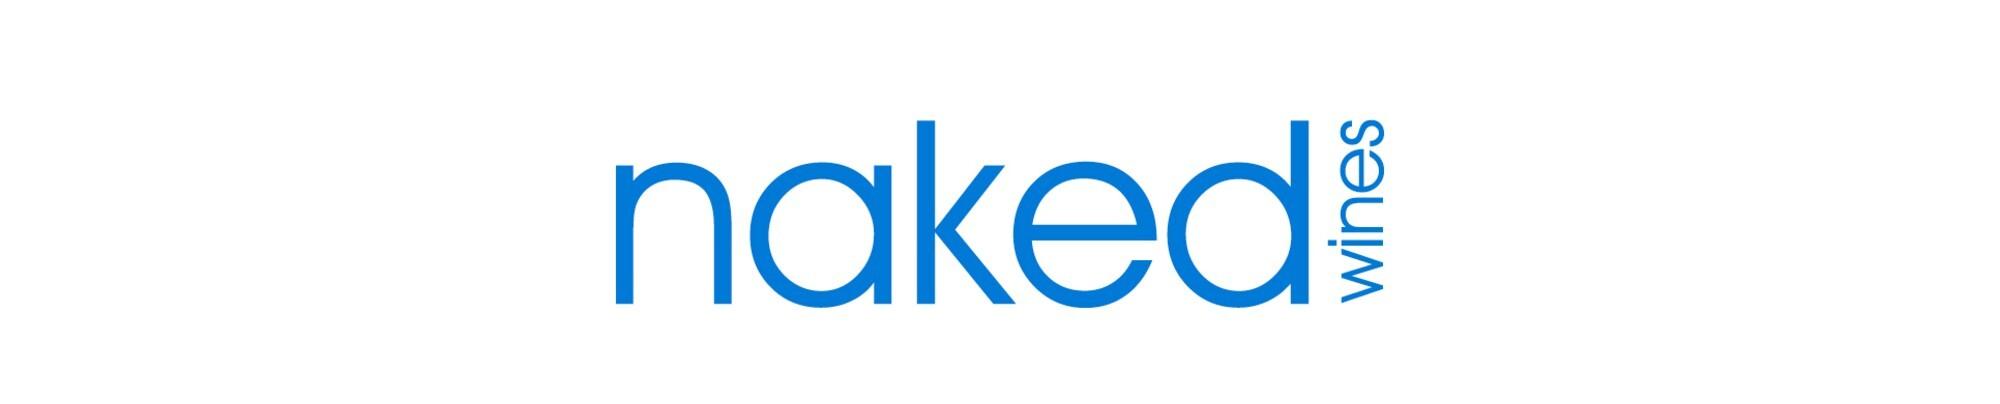 Naked_wines_logo_crop_0920.jpg?mtime=20201001100635#asset:467776